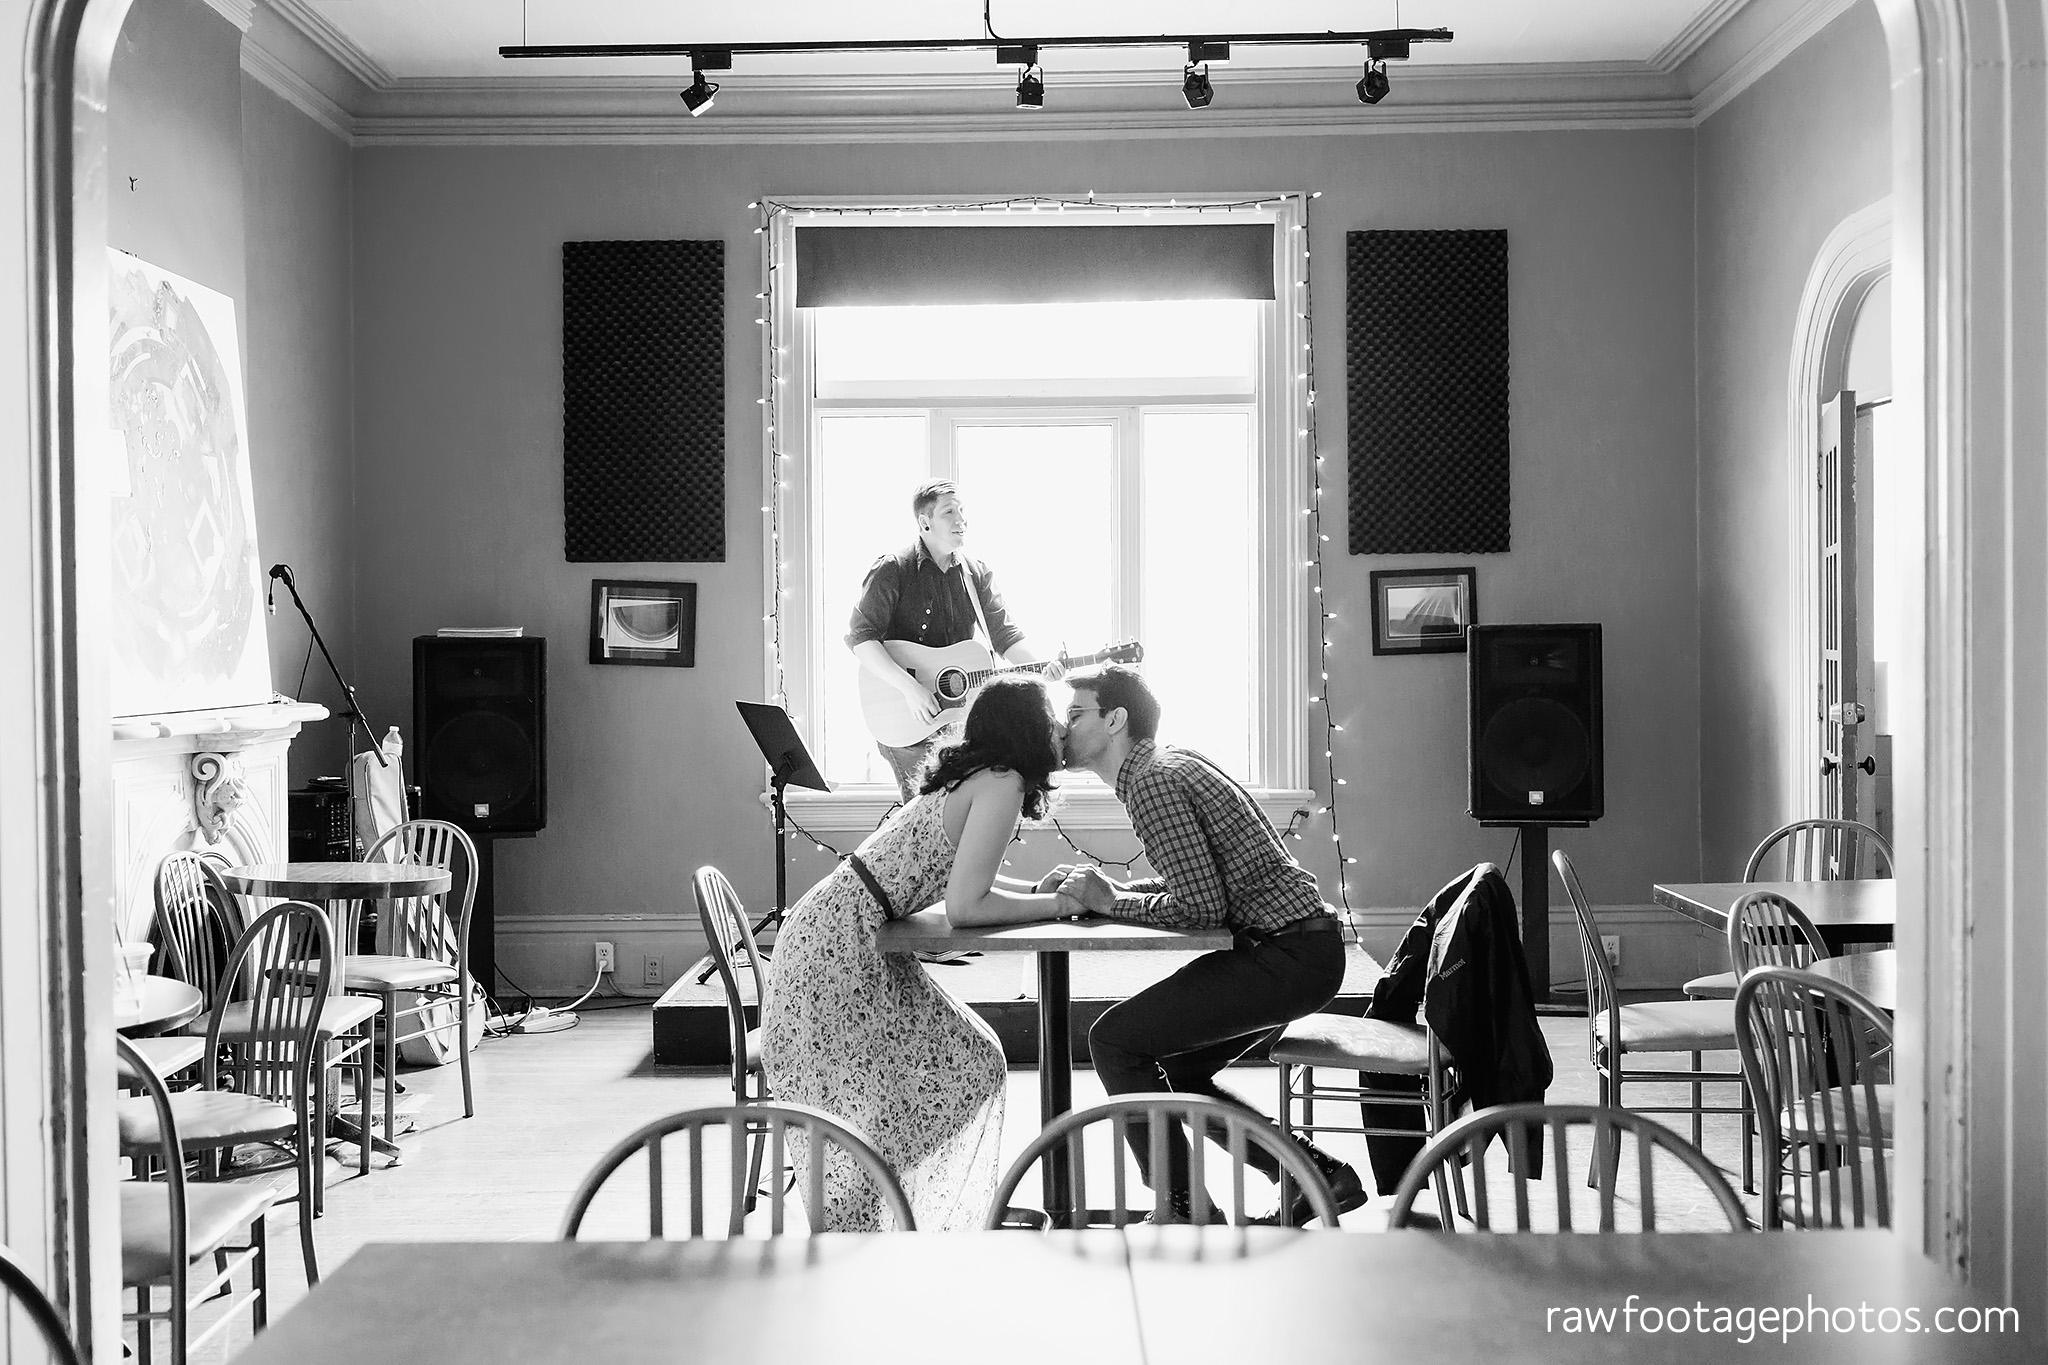 london_ontario_photographer-proposal_photographer-surprise_proposal-london_music_club-raw_footage_photography-wedding_photographer004.jpg